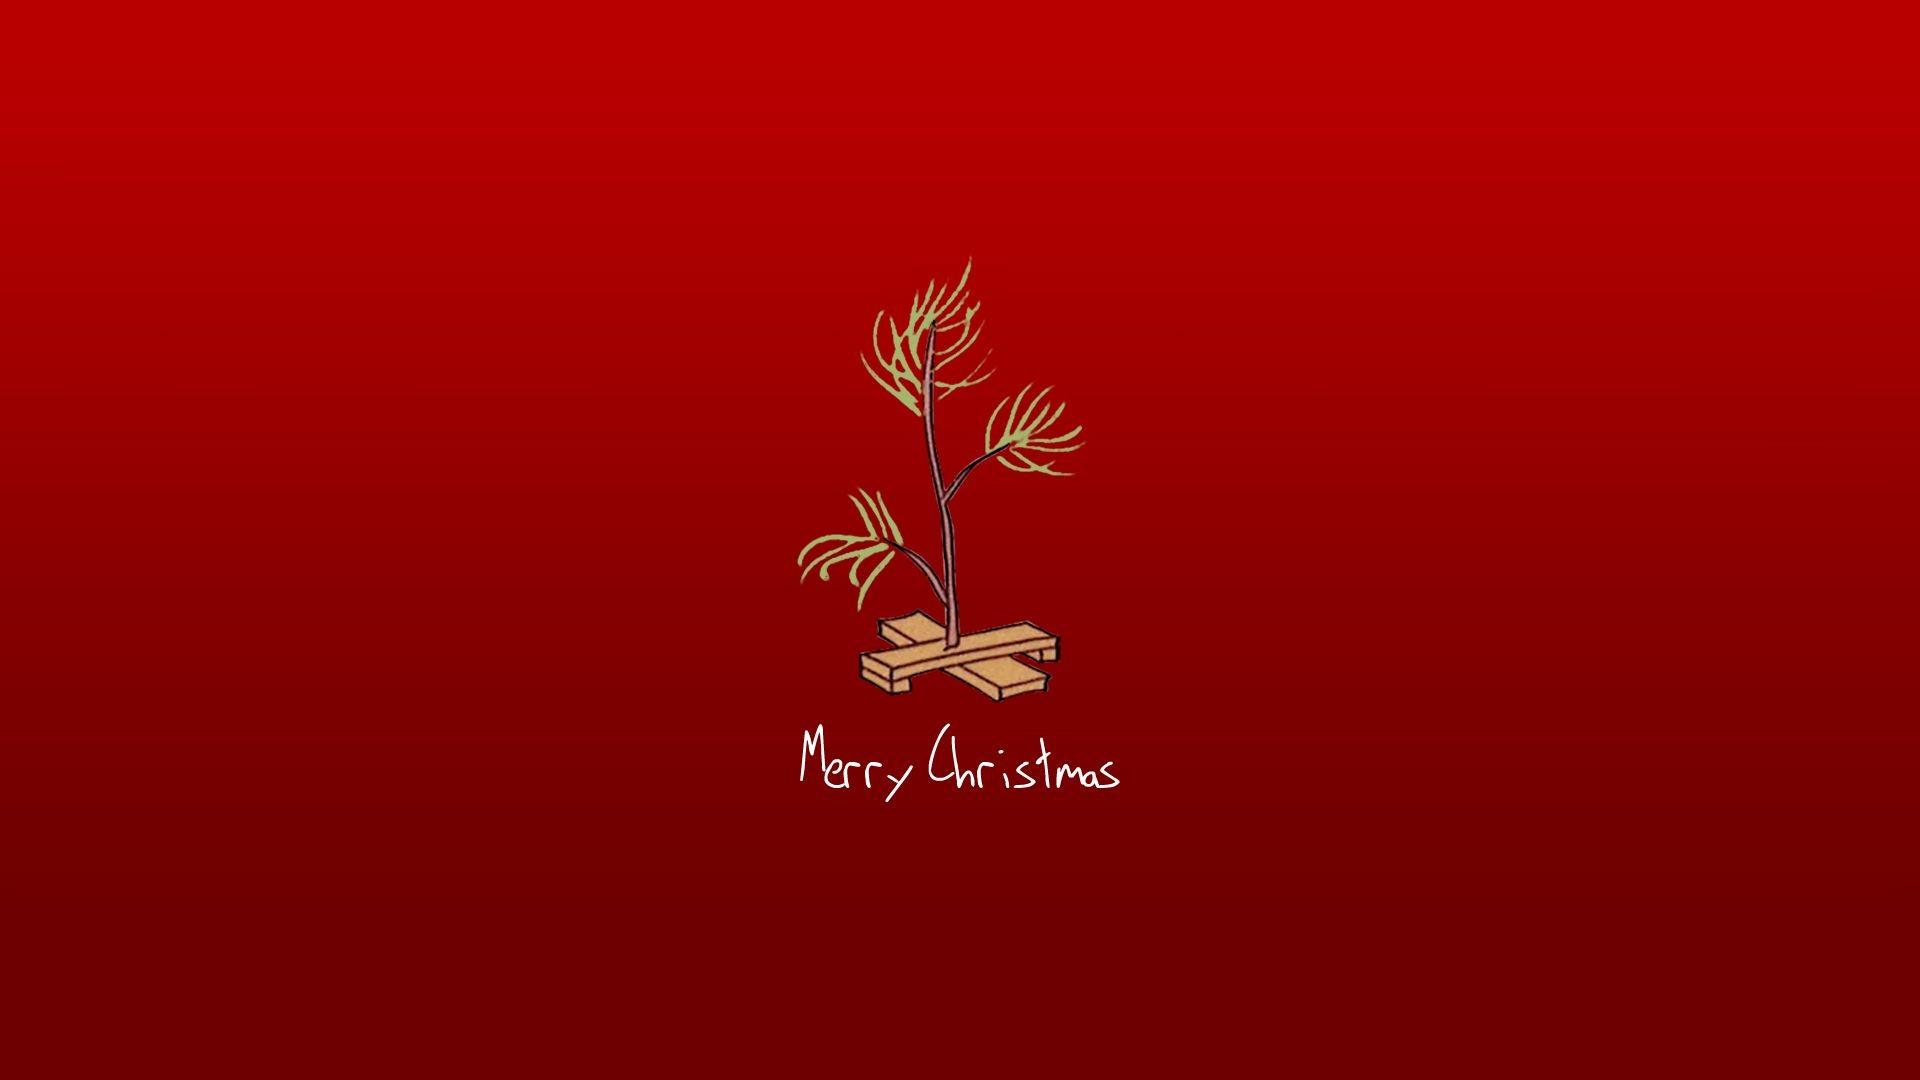 Charlie Brown Christmas Wallpaper Download Free Beautiful